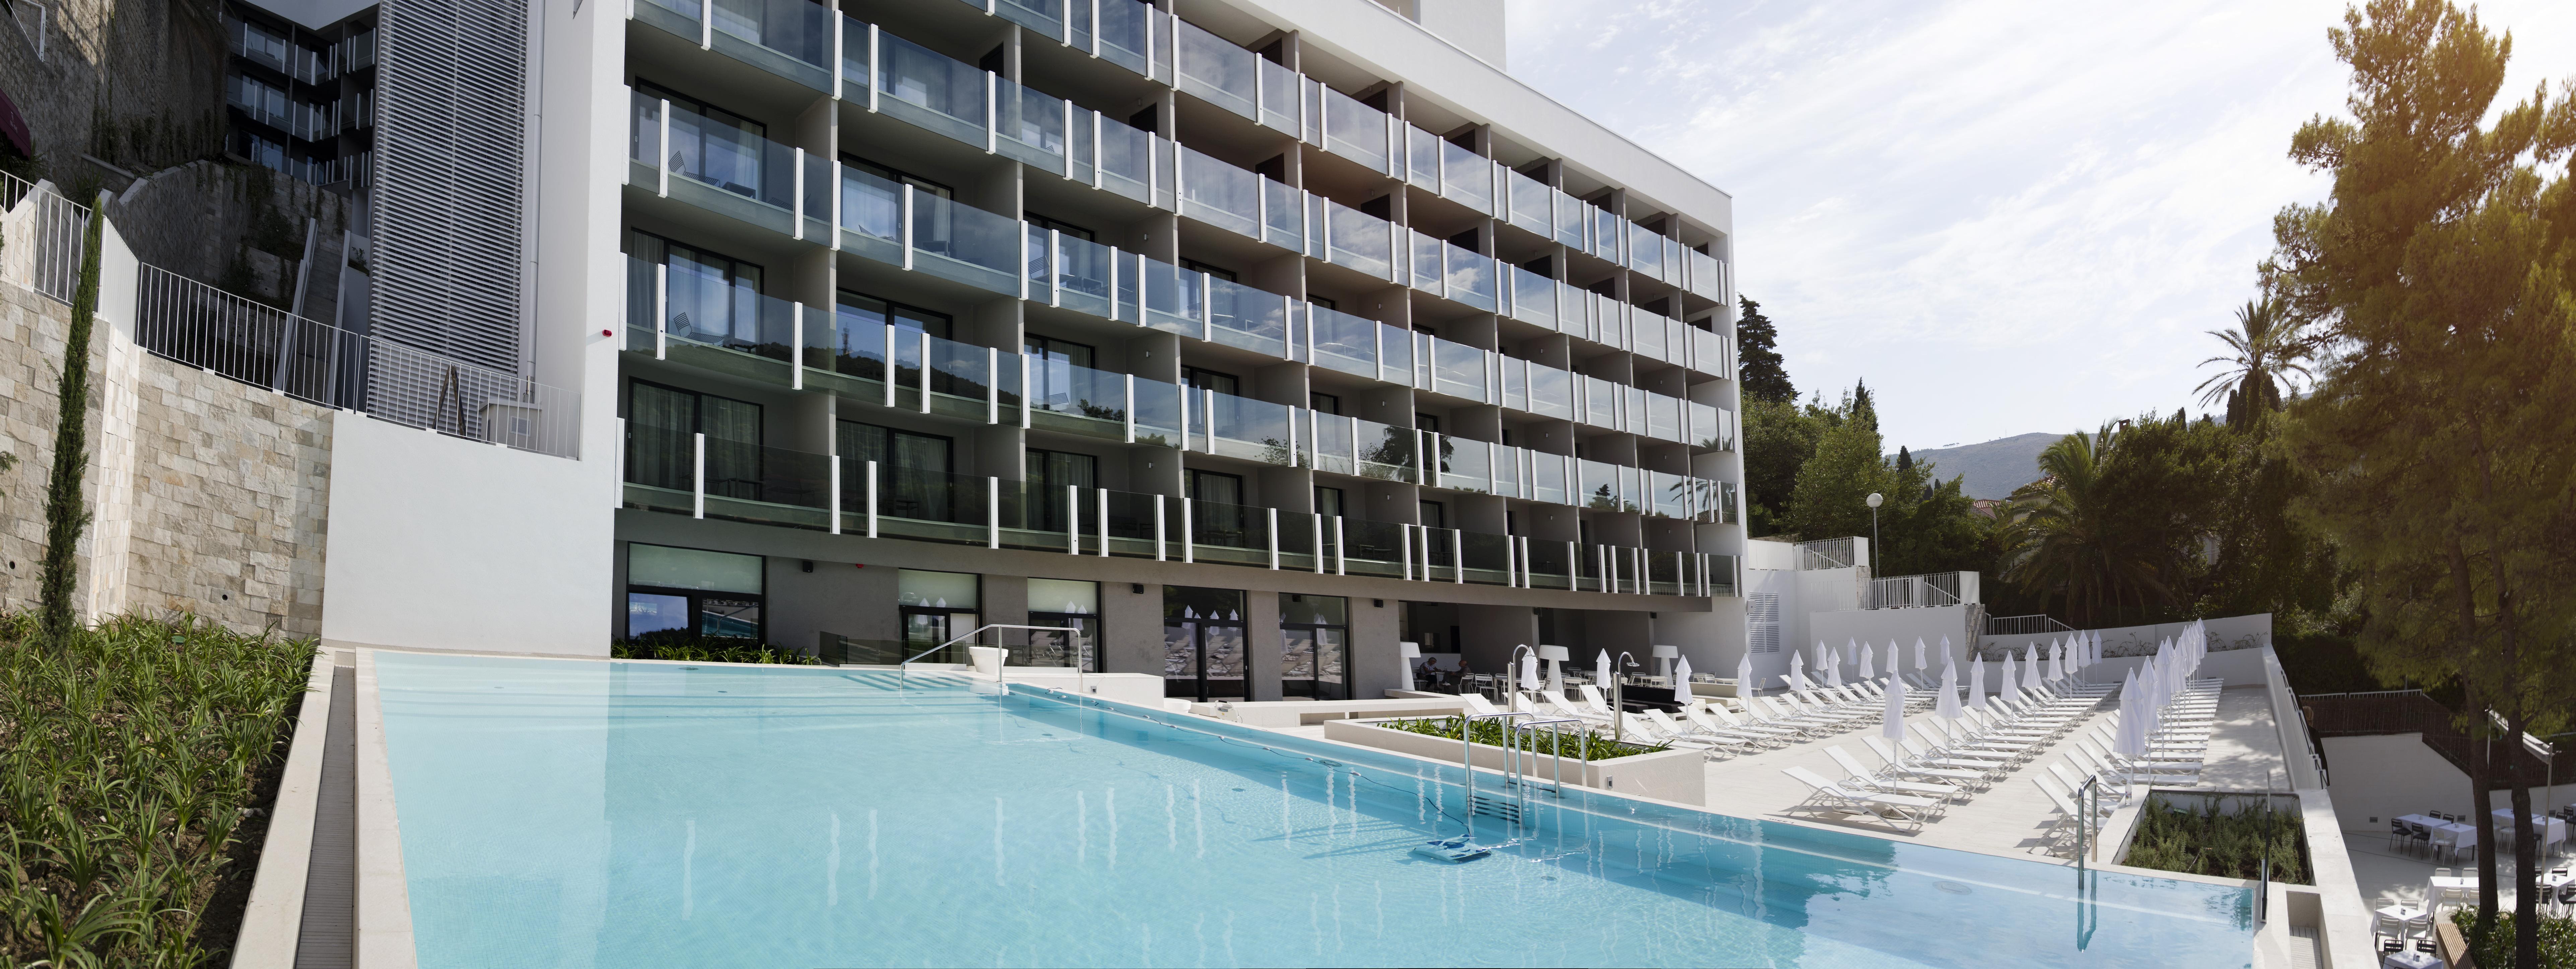 travel-concierge-croatia-holidays